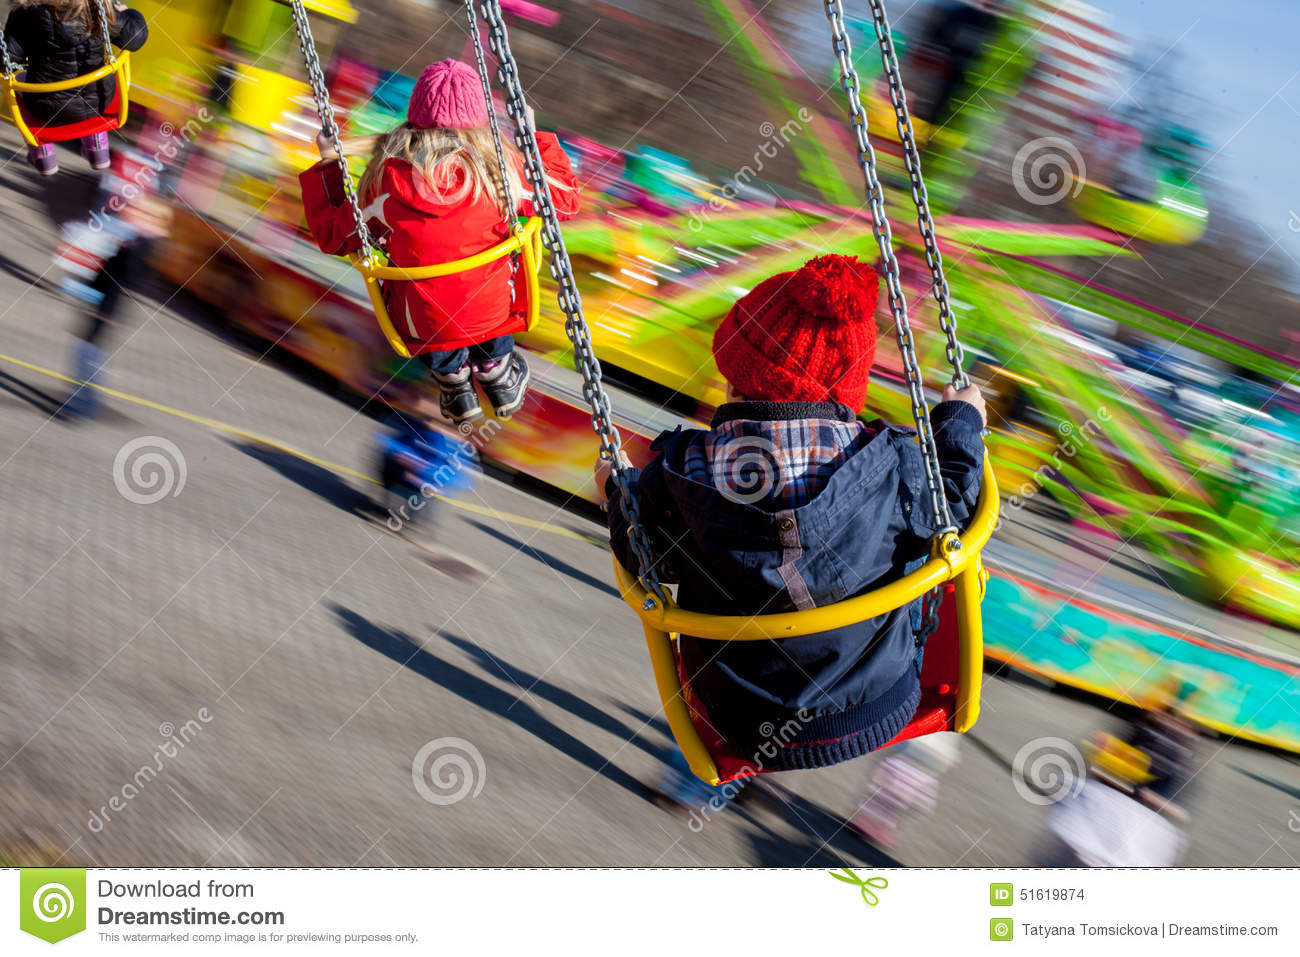 Kids, Having Fun On A Swing Chain Carousel Ride Stock Photo.